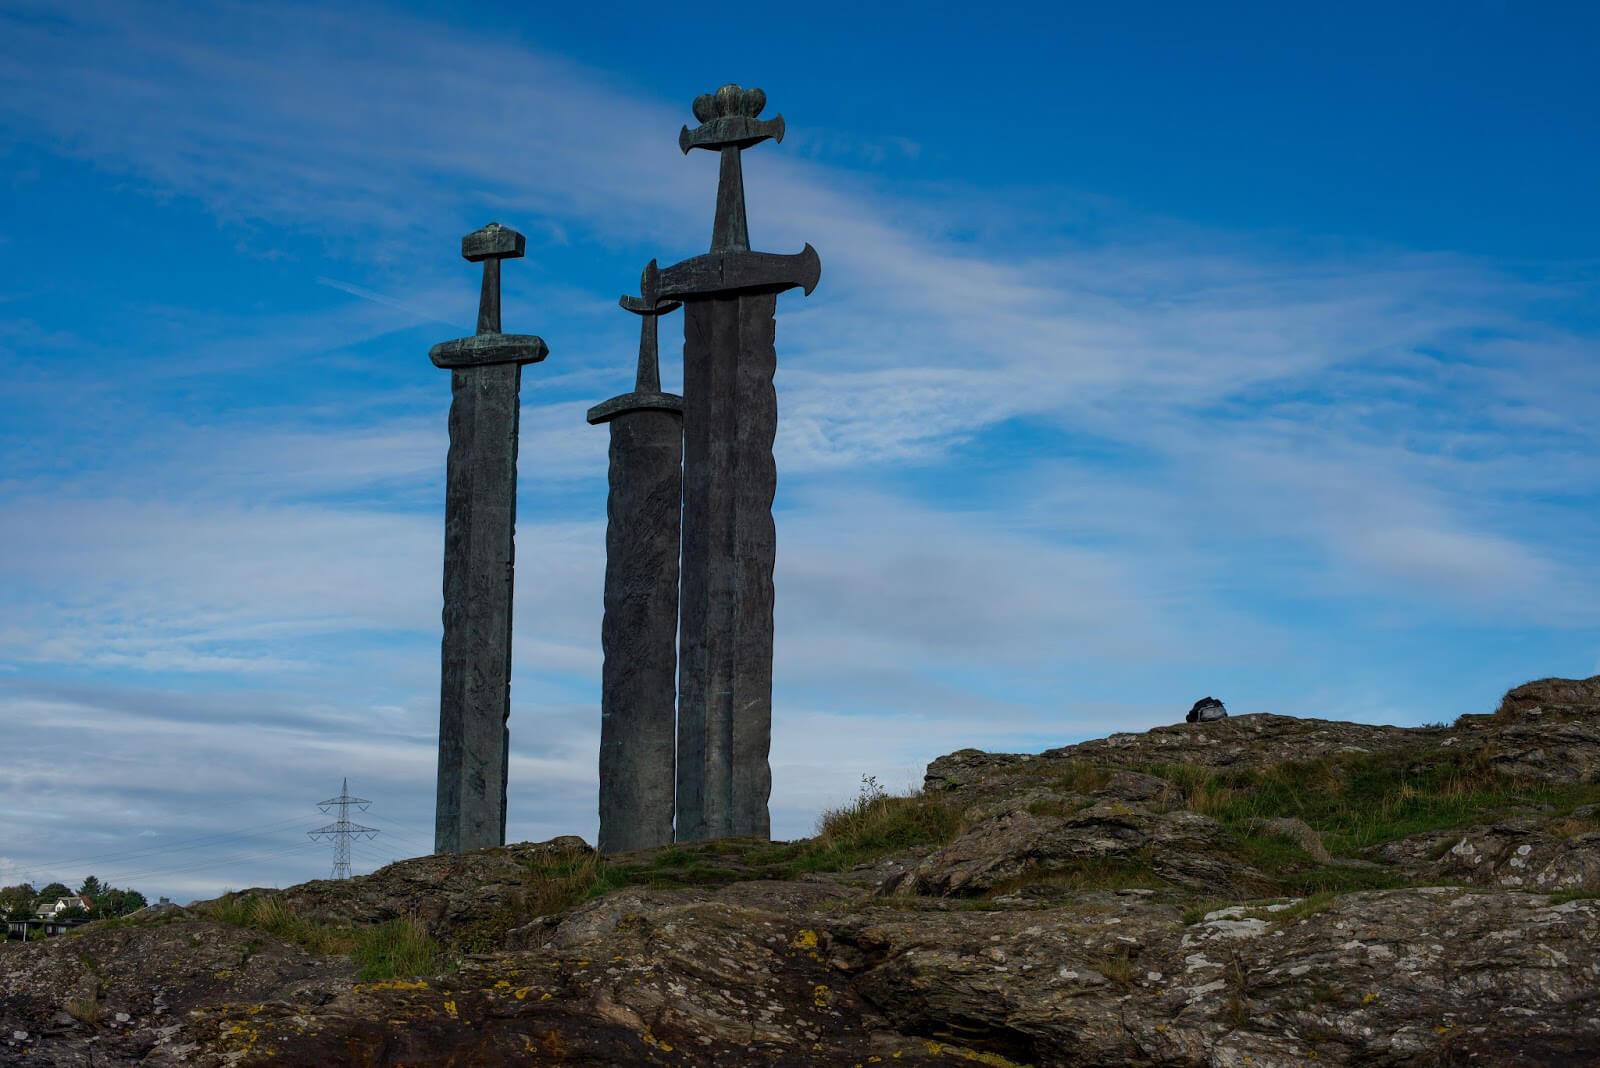 Монумент мечи в камне